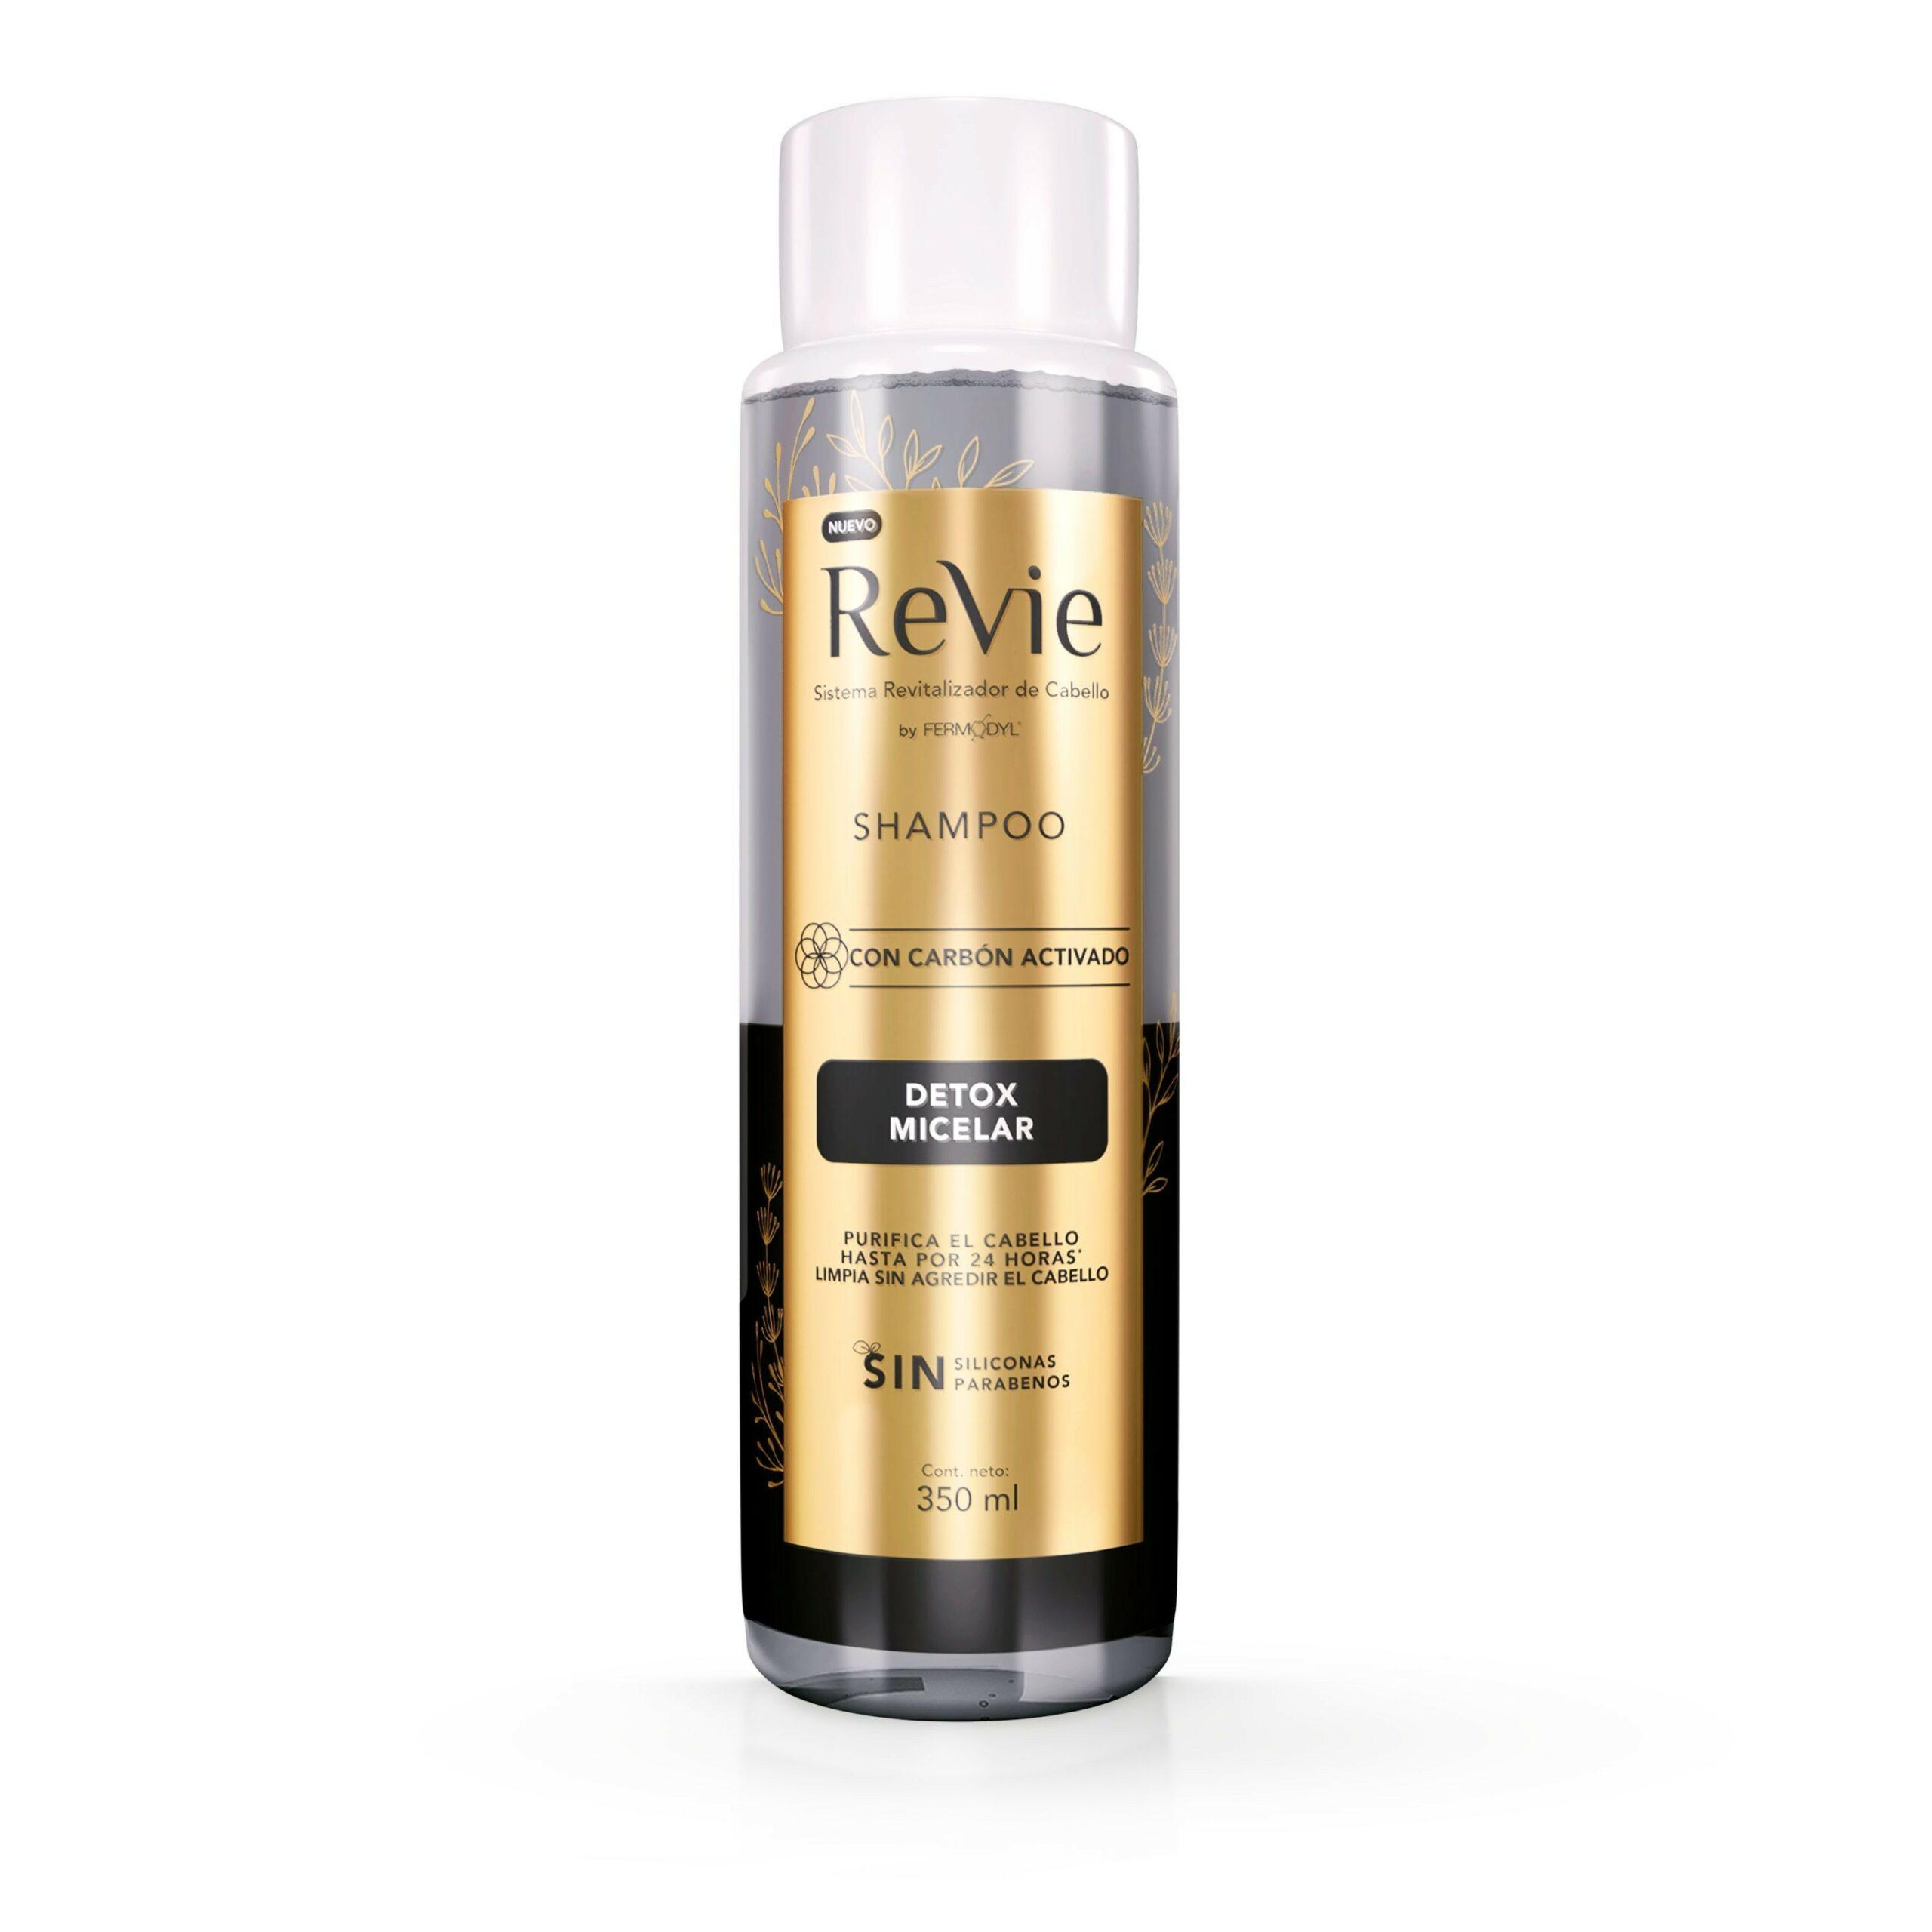 Revie Shampoo Detox Micelar 350 Ml